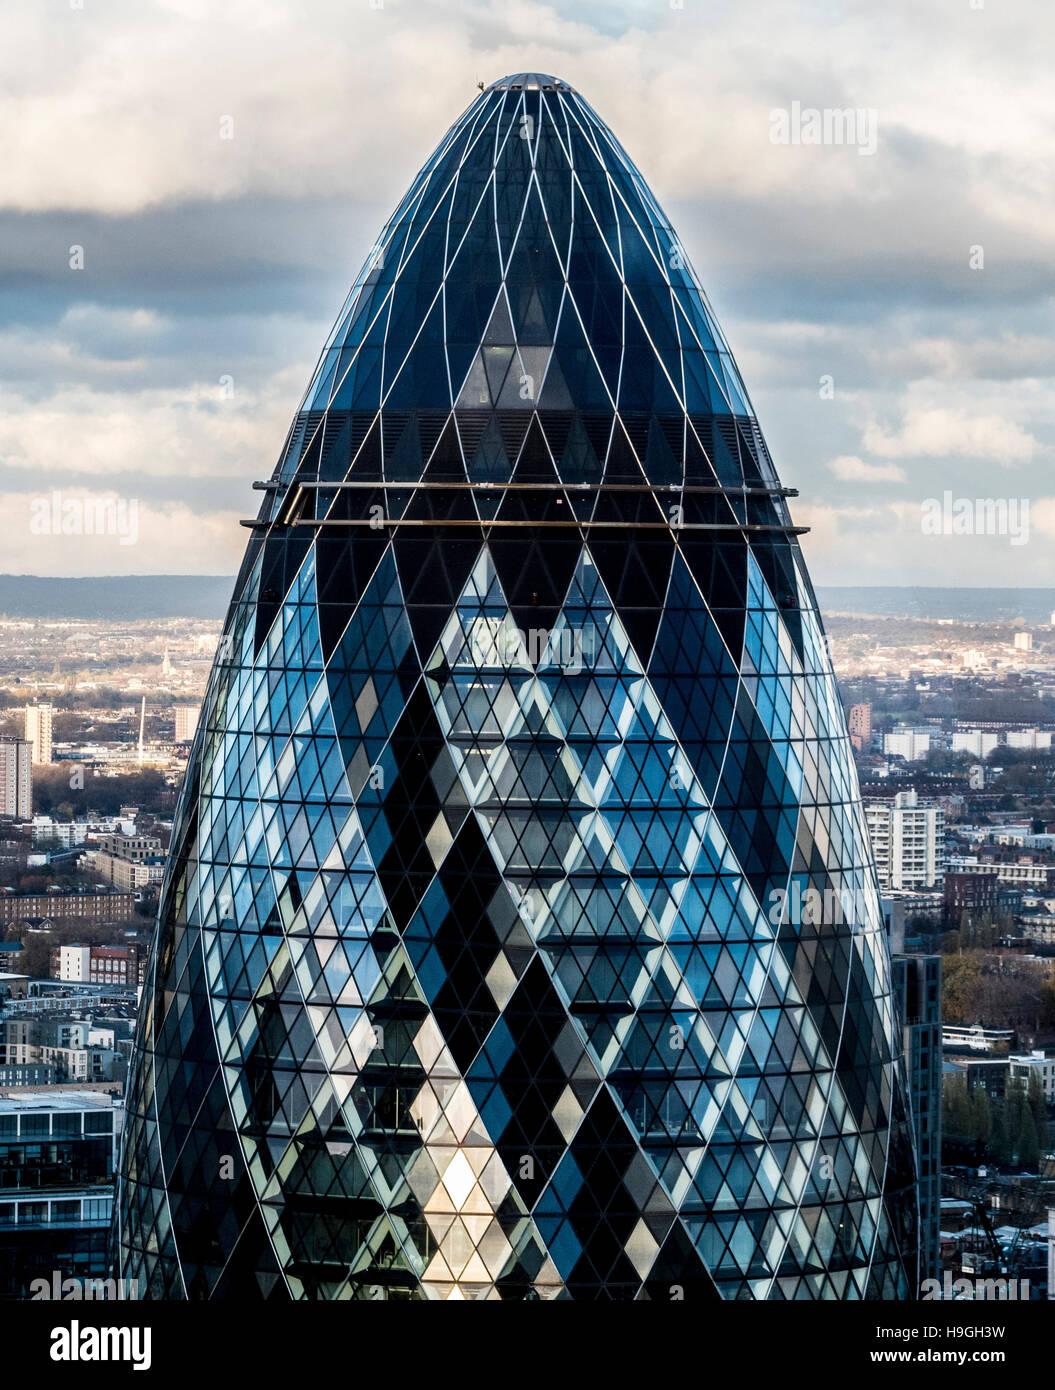 The Gherkin building, London, UK. - Stock Image